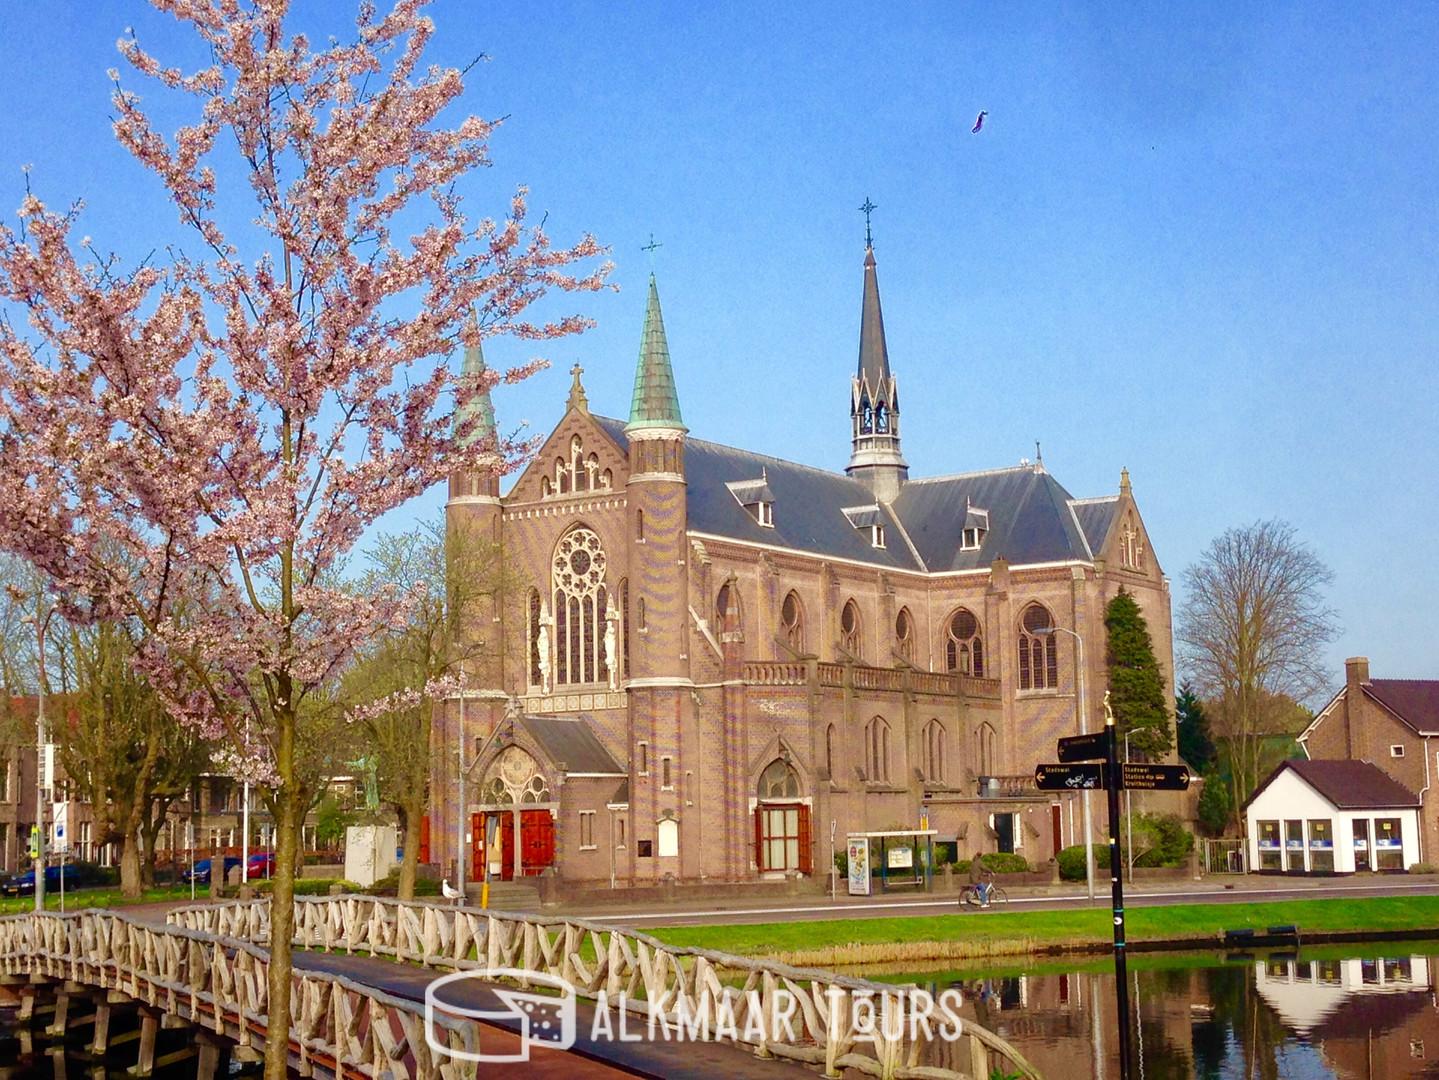 St Joseph's Church, Alkmaar